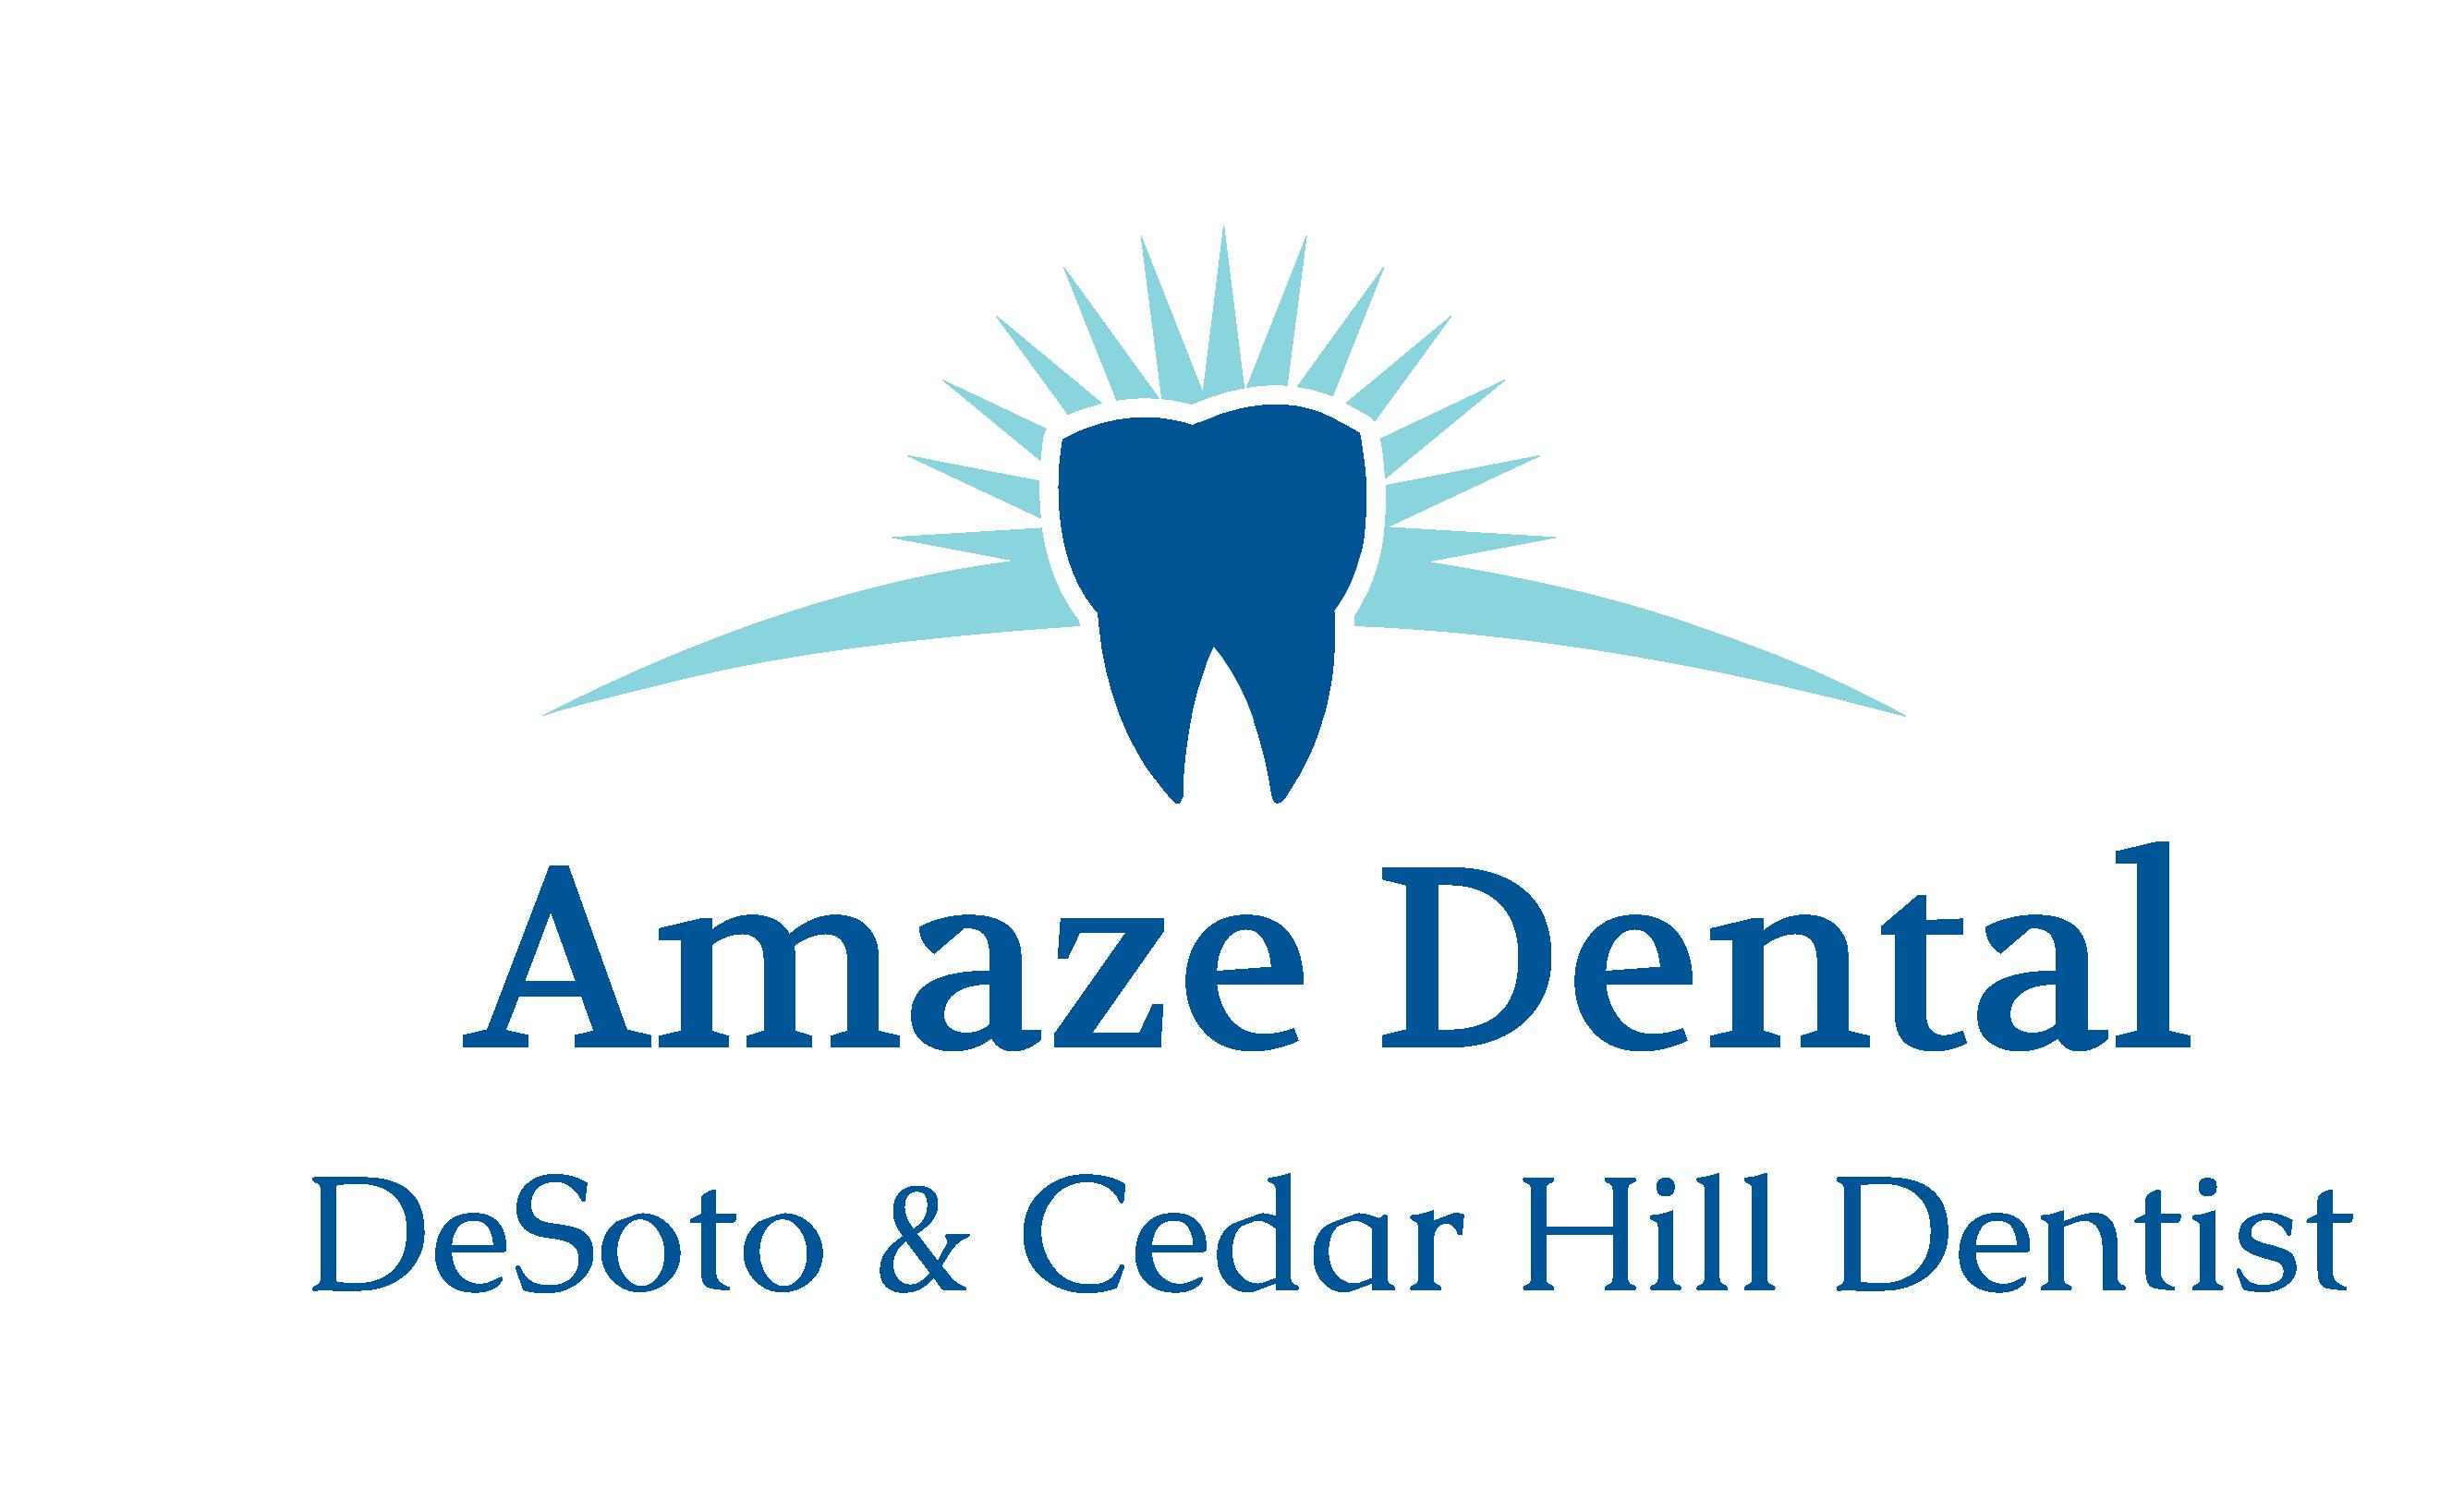 Amaze Dental - DeSoto & Cedar Hill Dentist reviews | Dental at 216 Dalton Dr - DeSoto TX